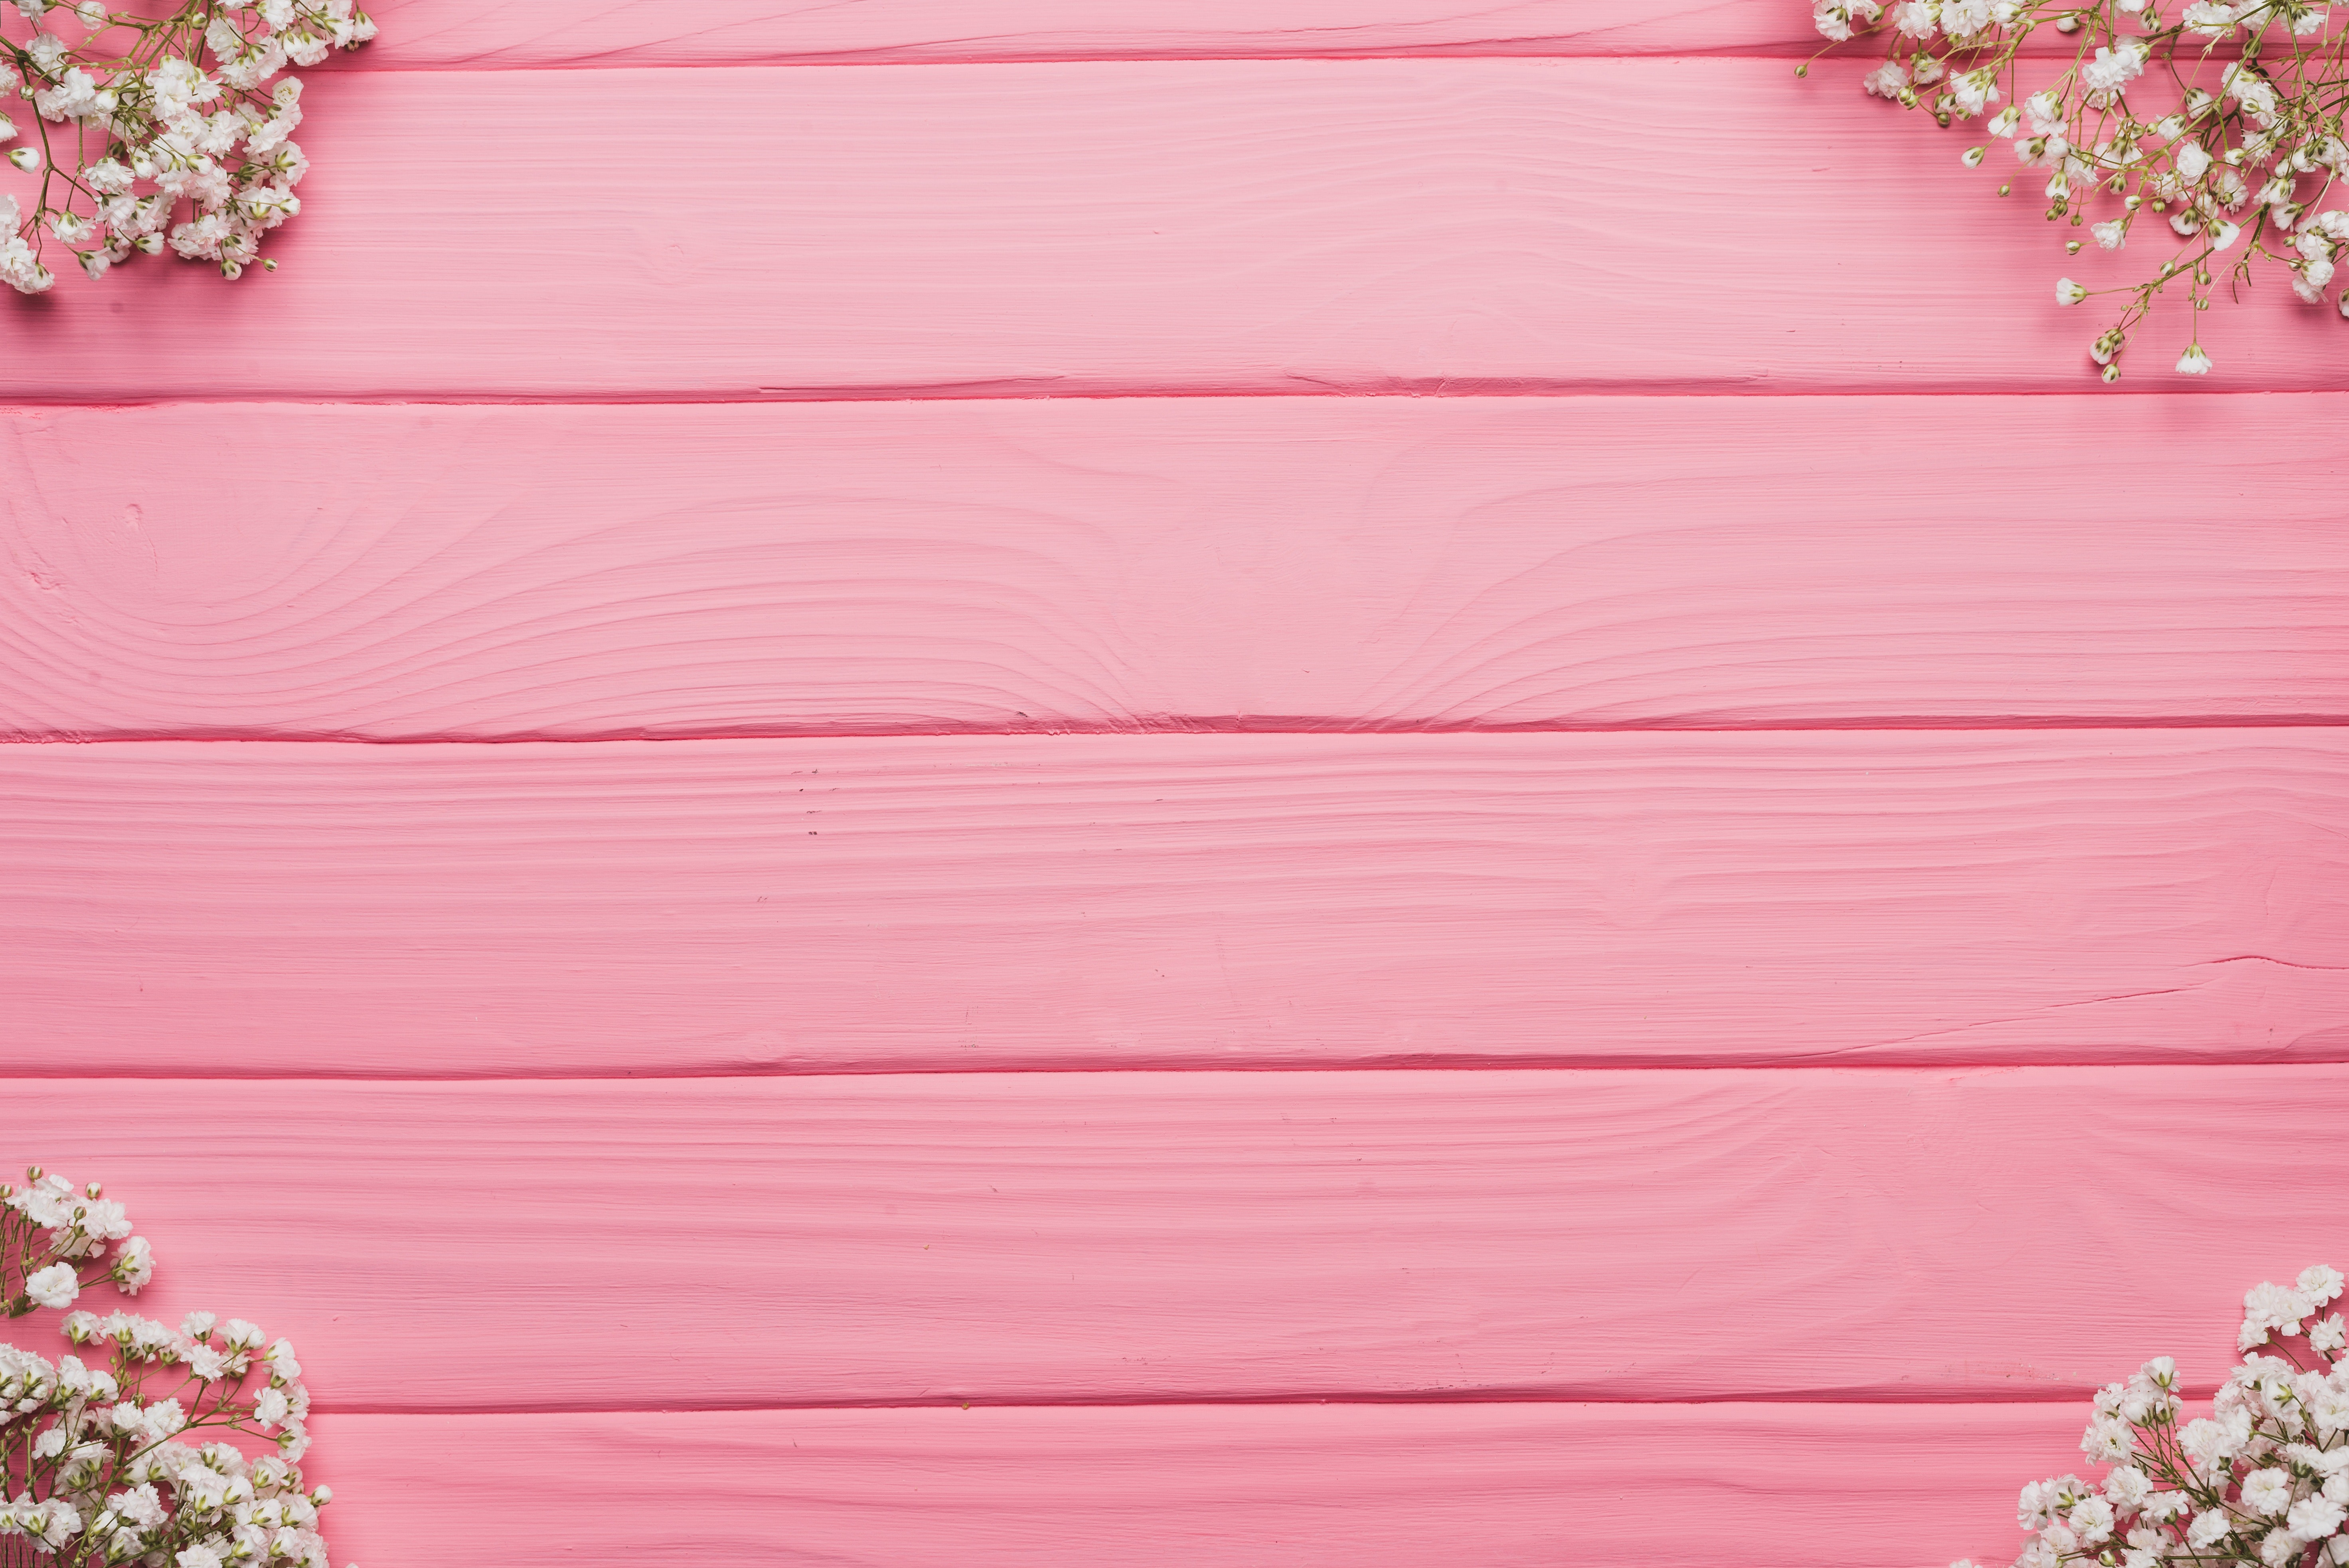 1000+ Amazing Pink Background Photos · Pexels · Free Stock Photos